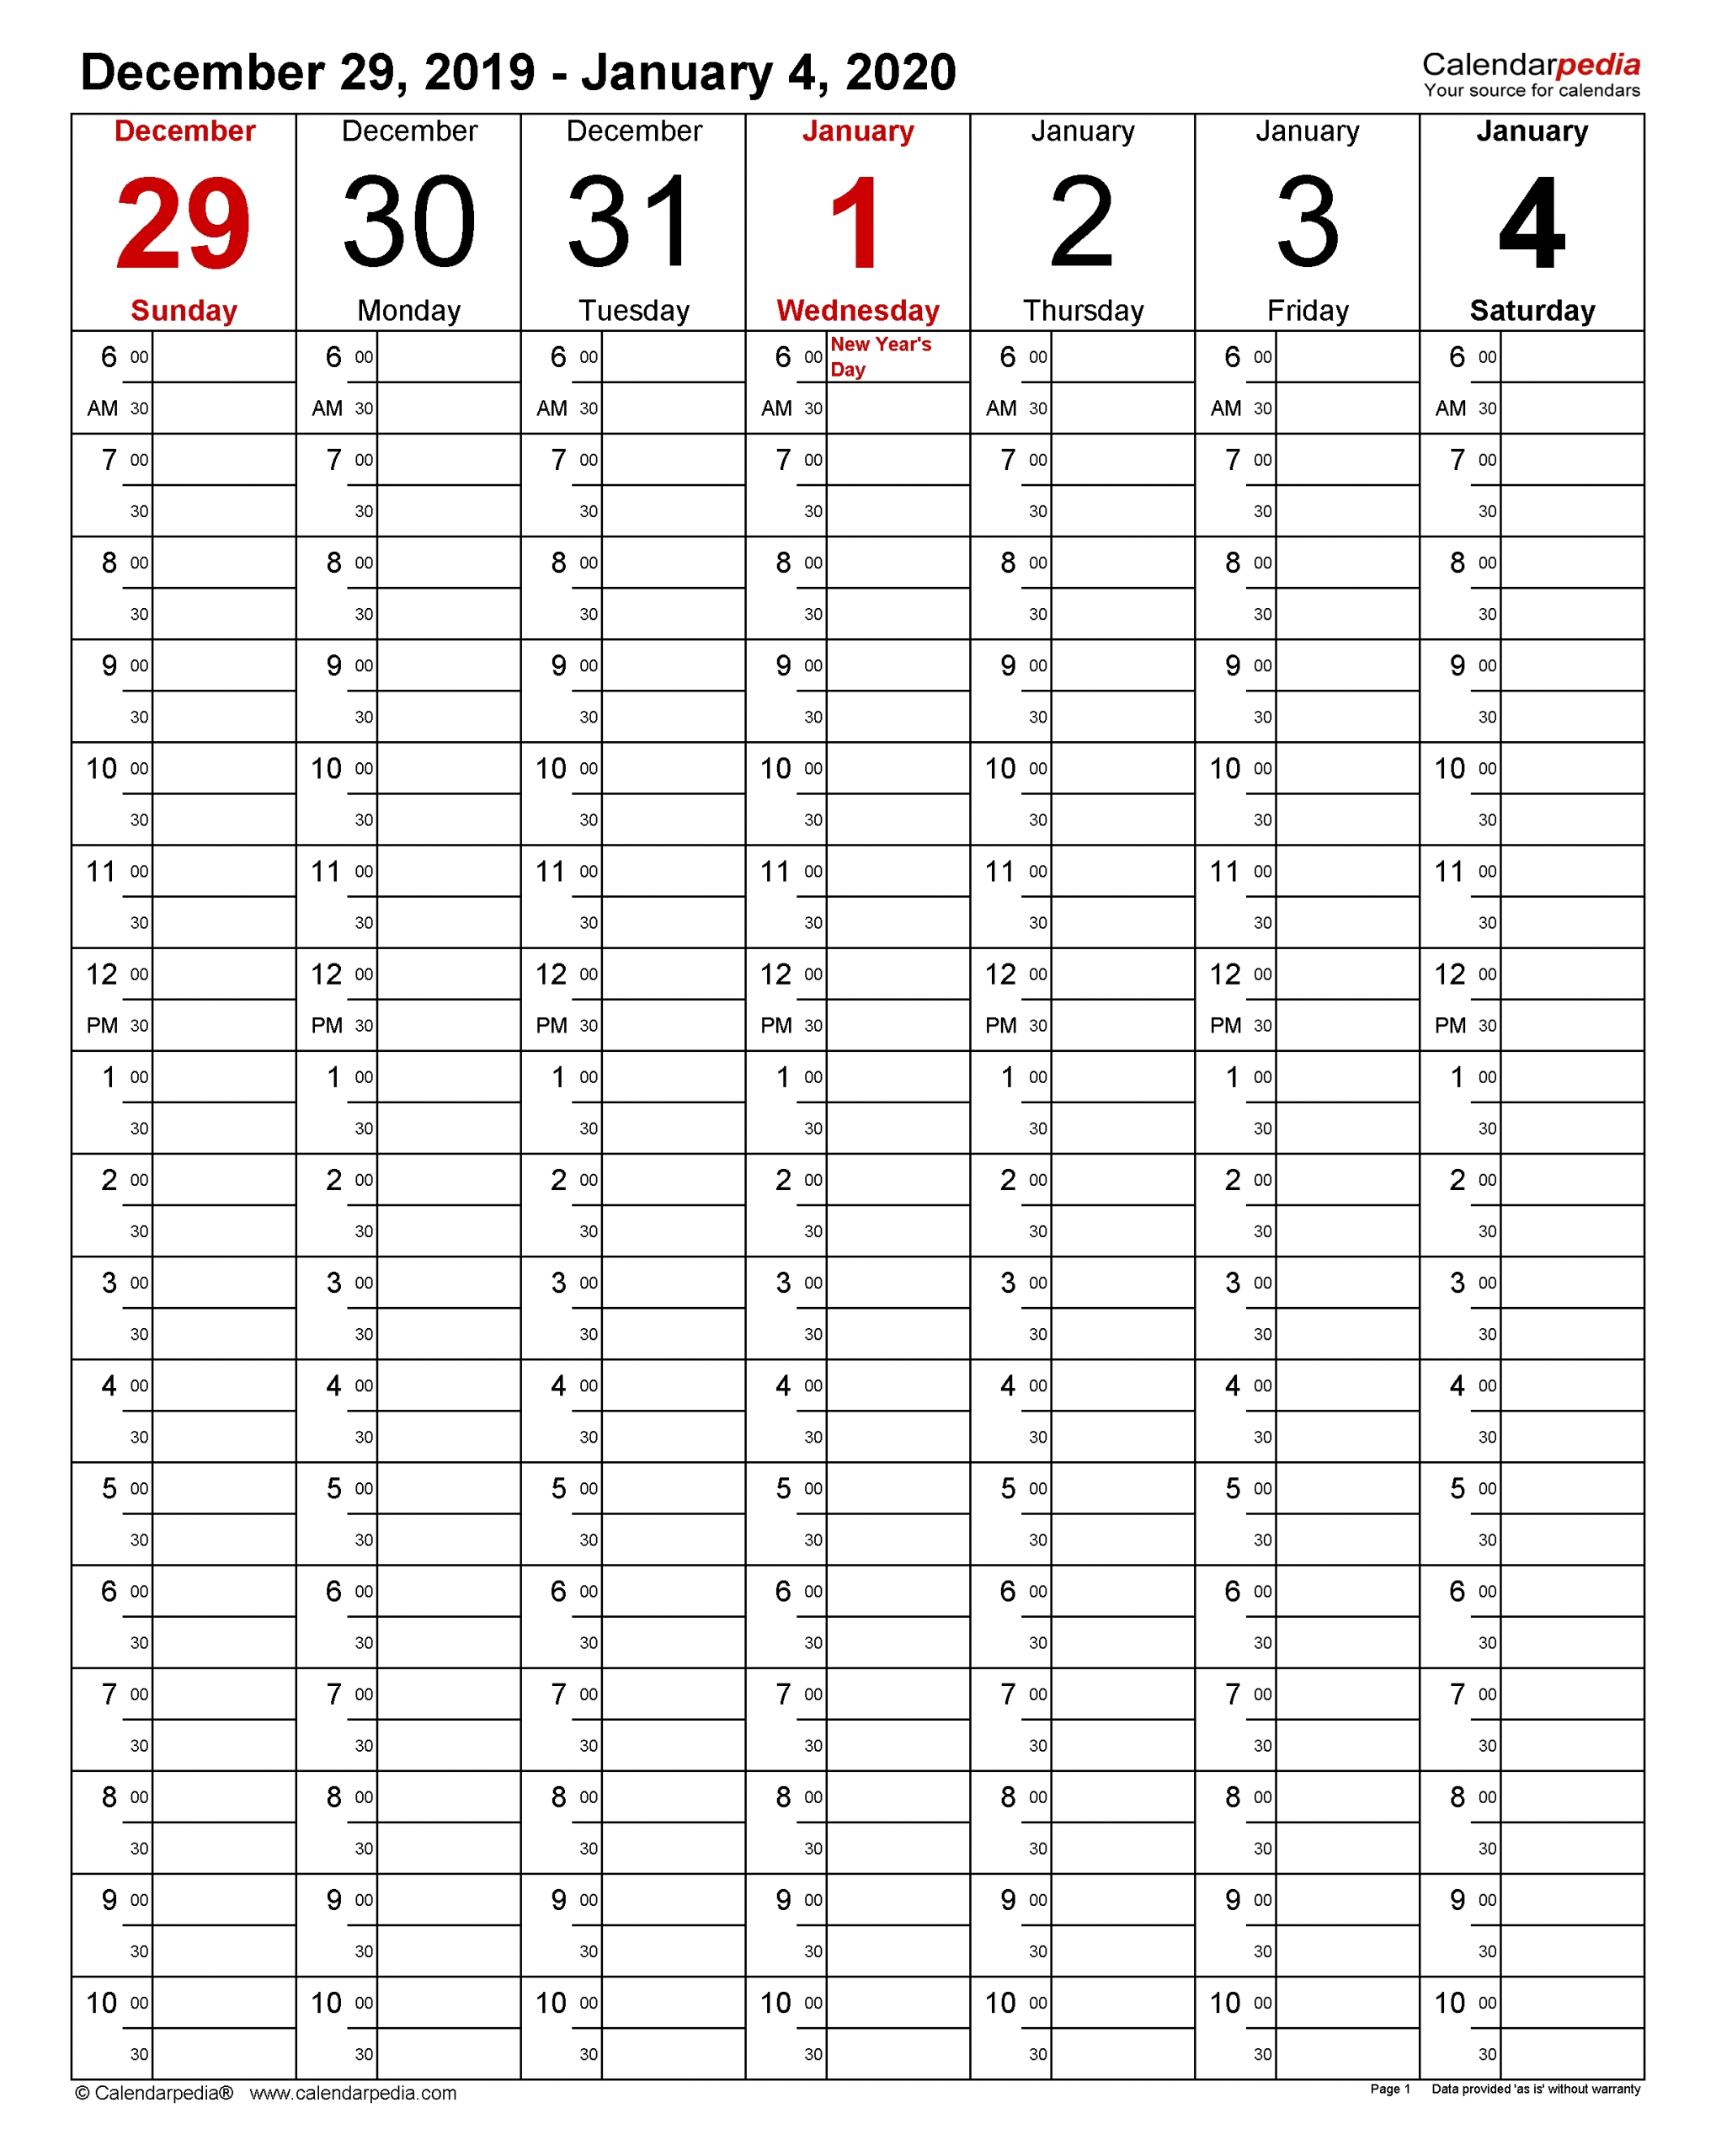 Weekly Calendars 2020 For Pdf - 12 Free Printable Templates  2020 Weekly Calendar